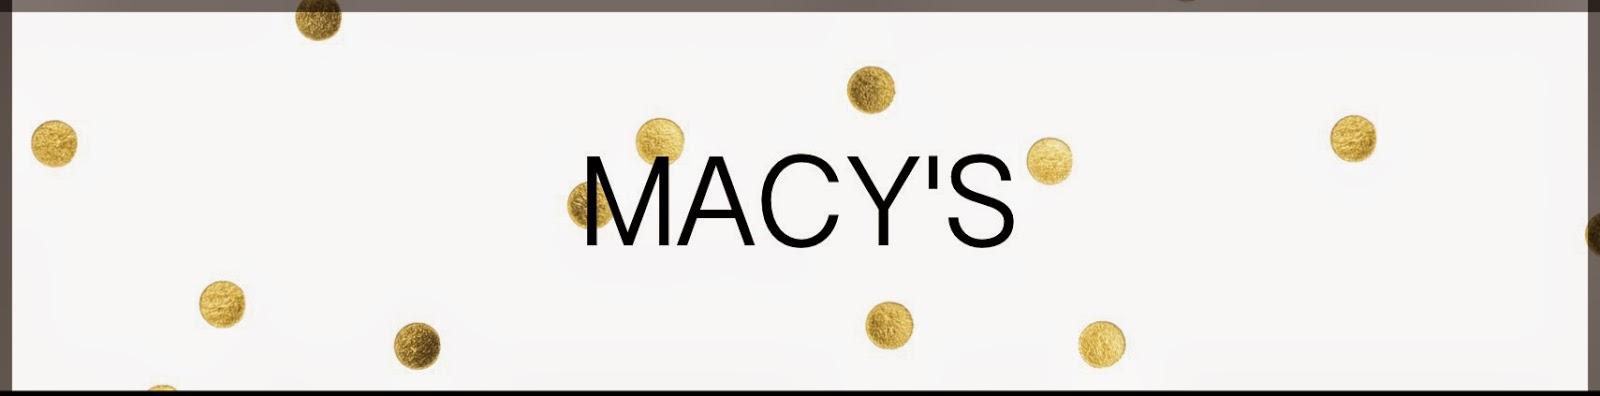 http://www.macys.com/